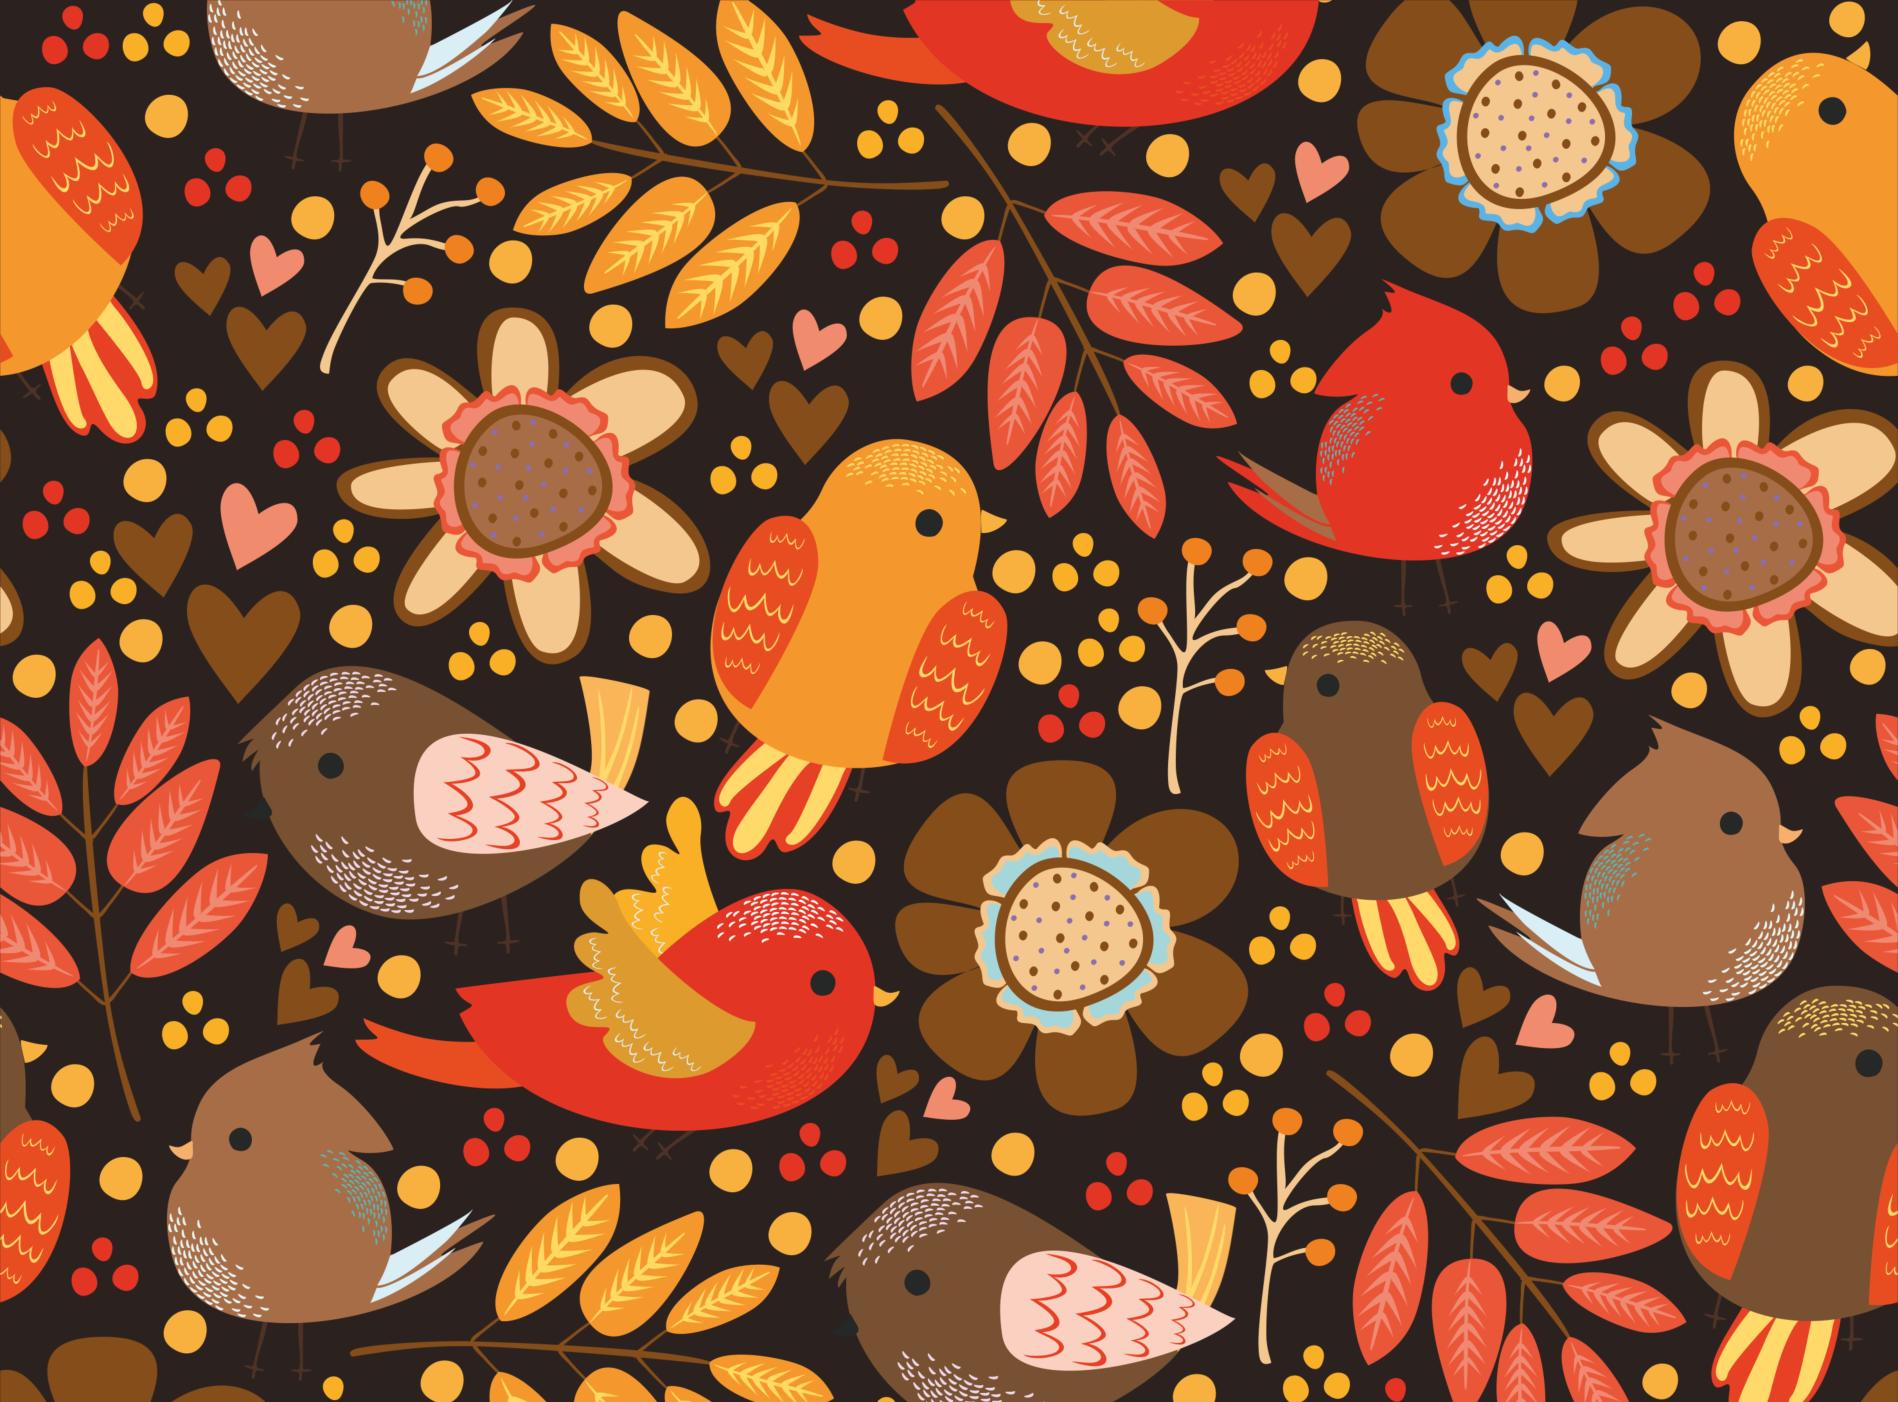 Birds set 2 (vector,jpg,png) example image 3